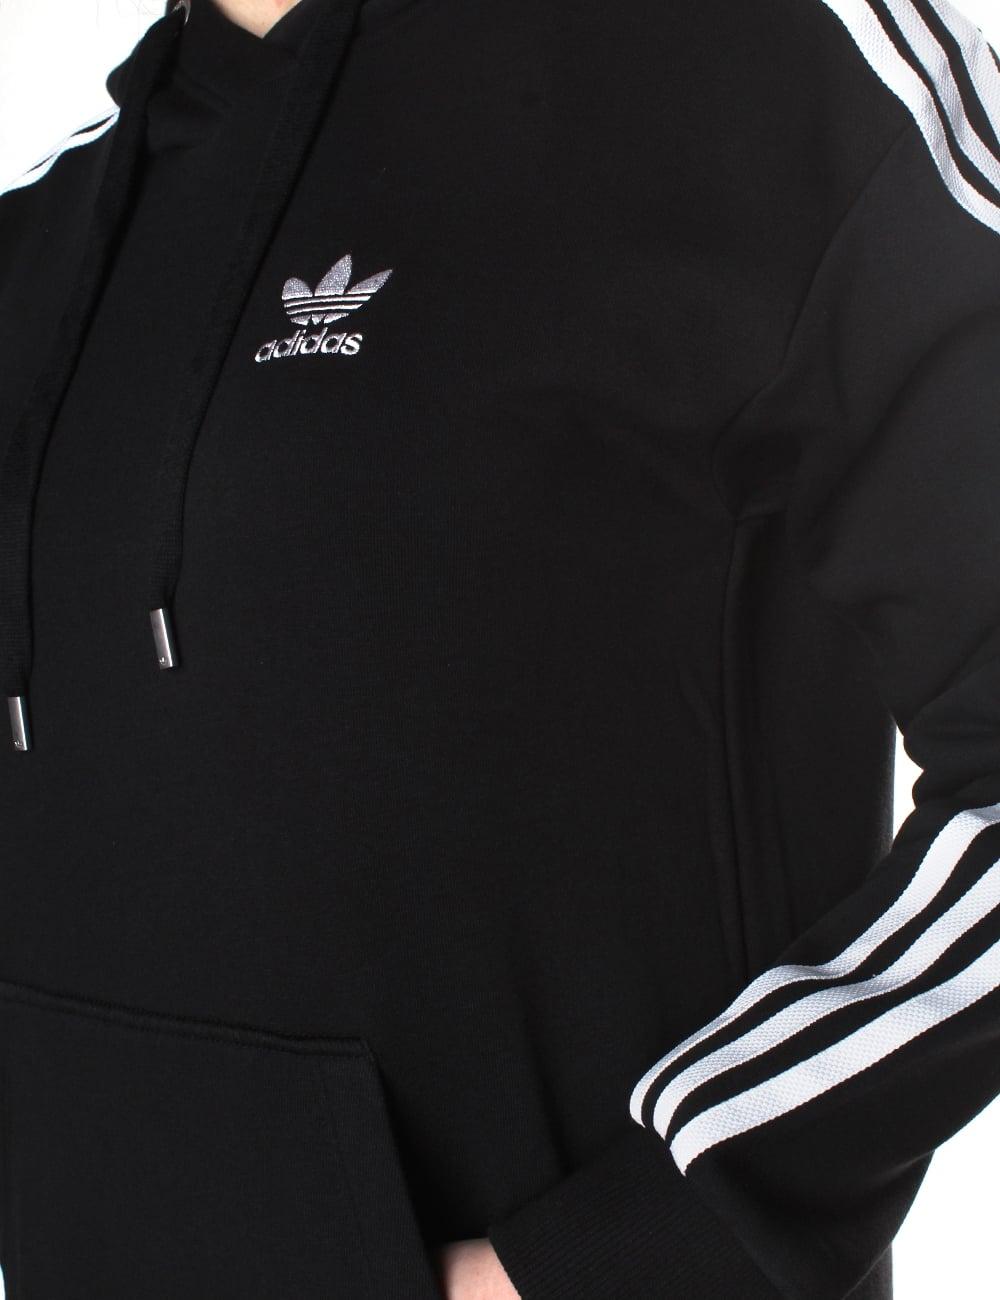 4e9ecad7808f Adidas Women s 3 Stripes Hoodie Dress